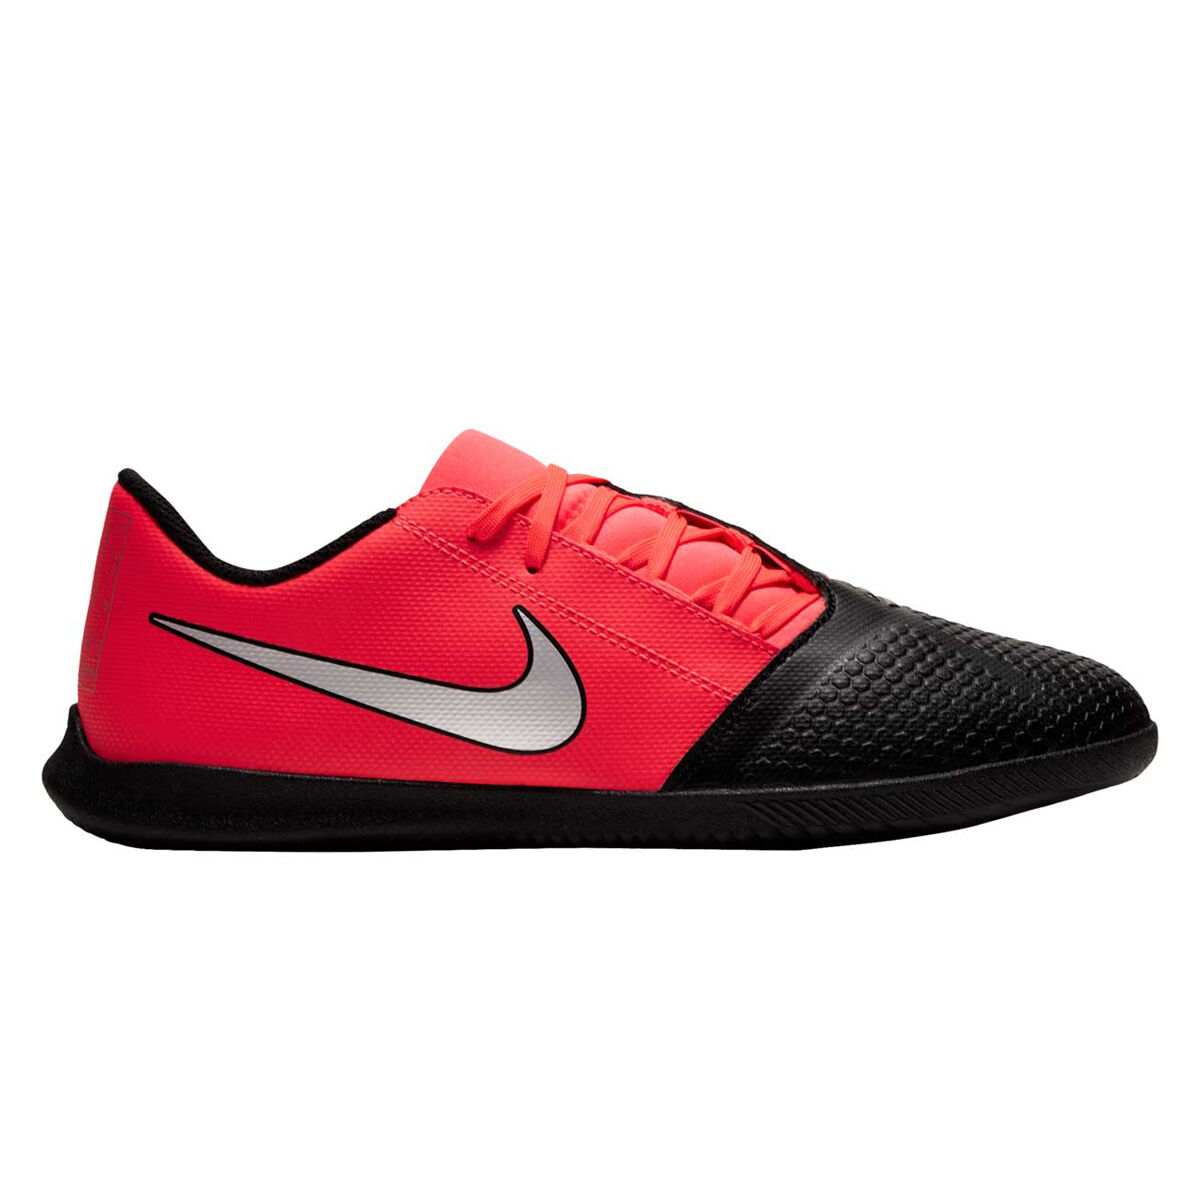 Nike Phantom Venom Indoor Soccer Shoes